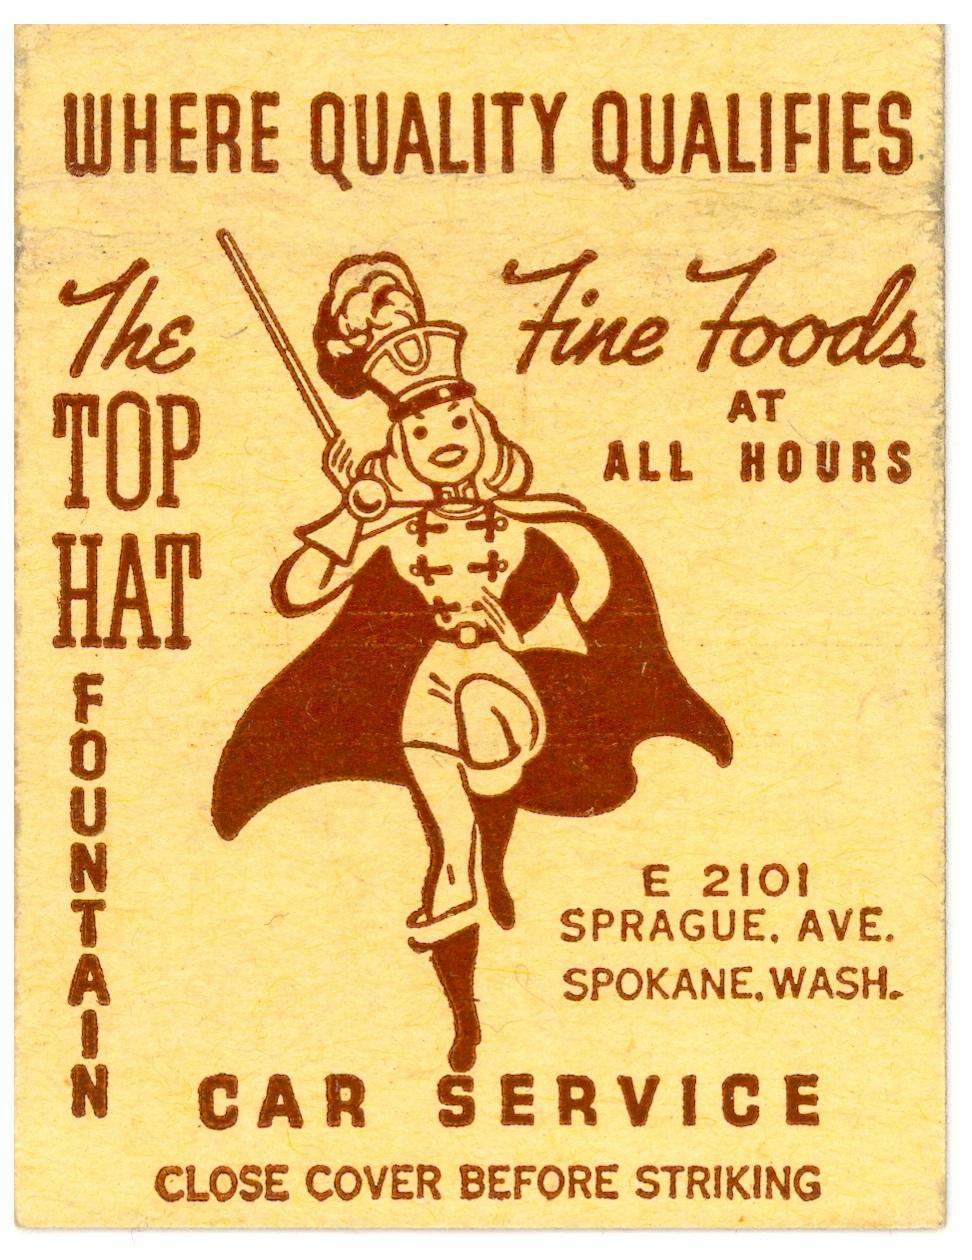 The Top Hat Fountain - 2101 East Sprague Avenue, Spokane, Washington U.S.A. - date unknown